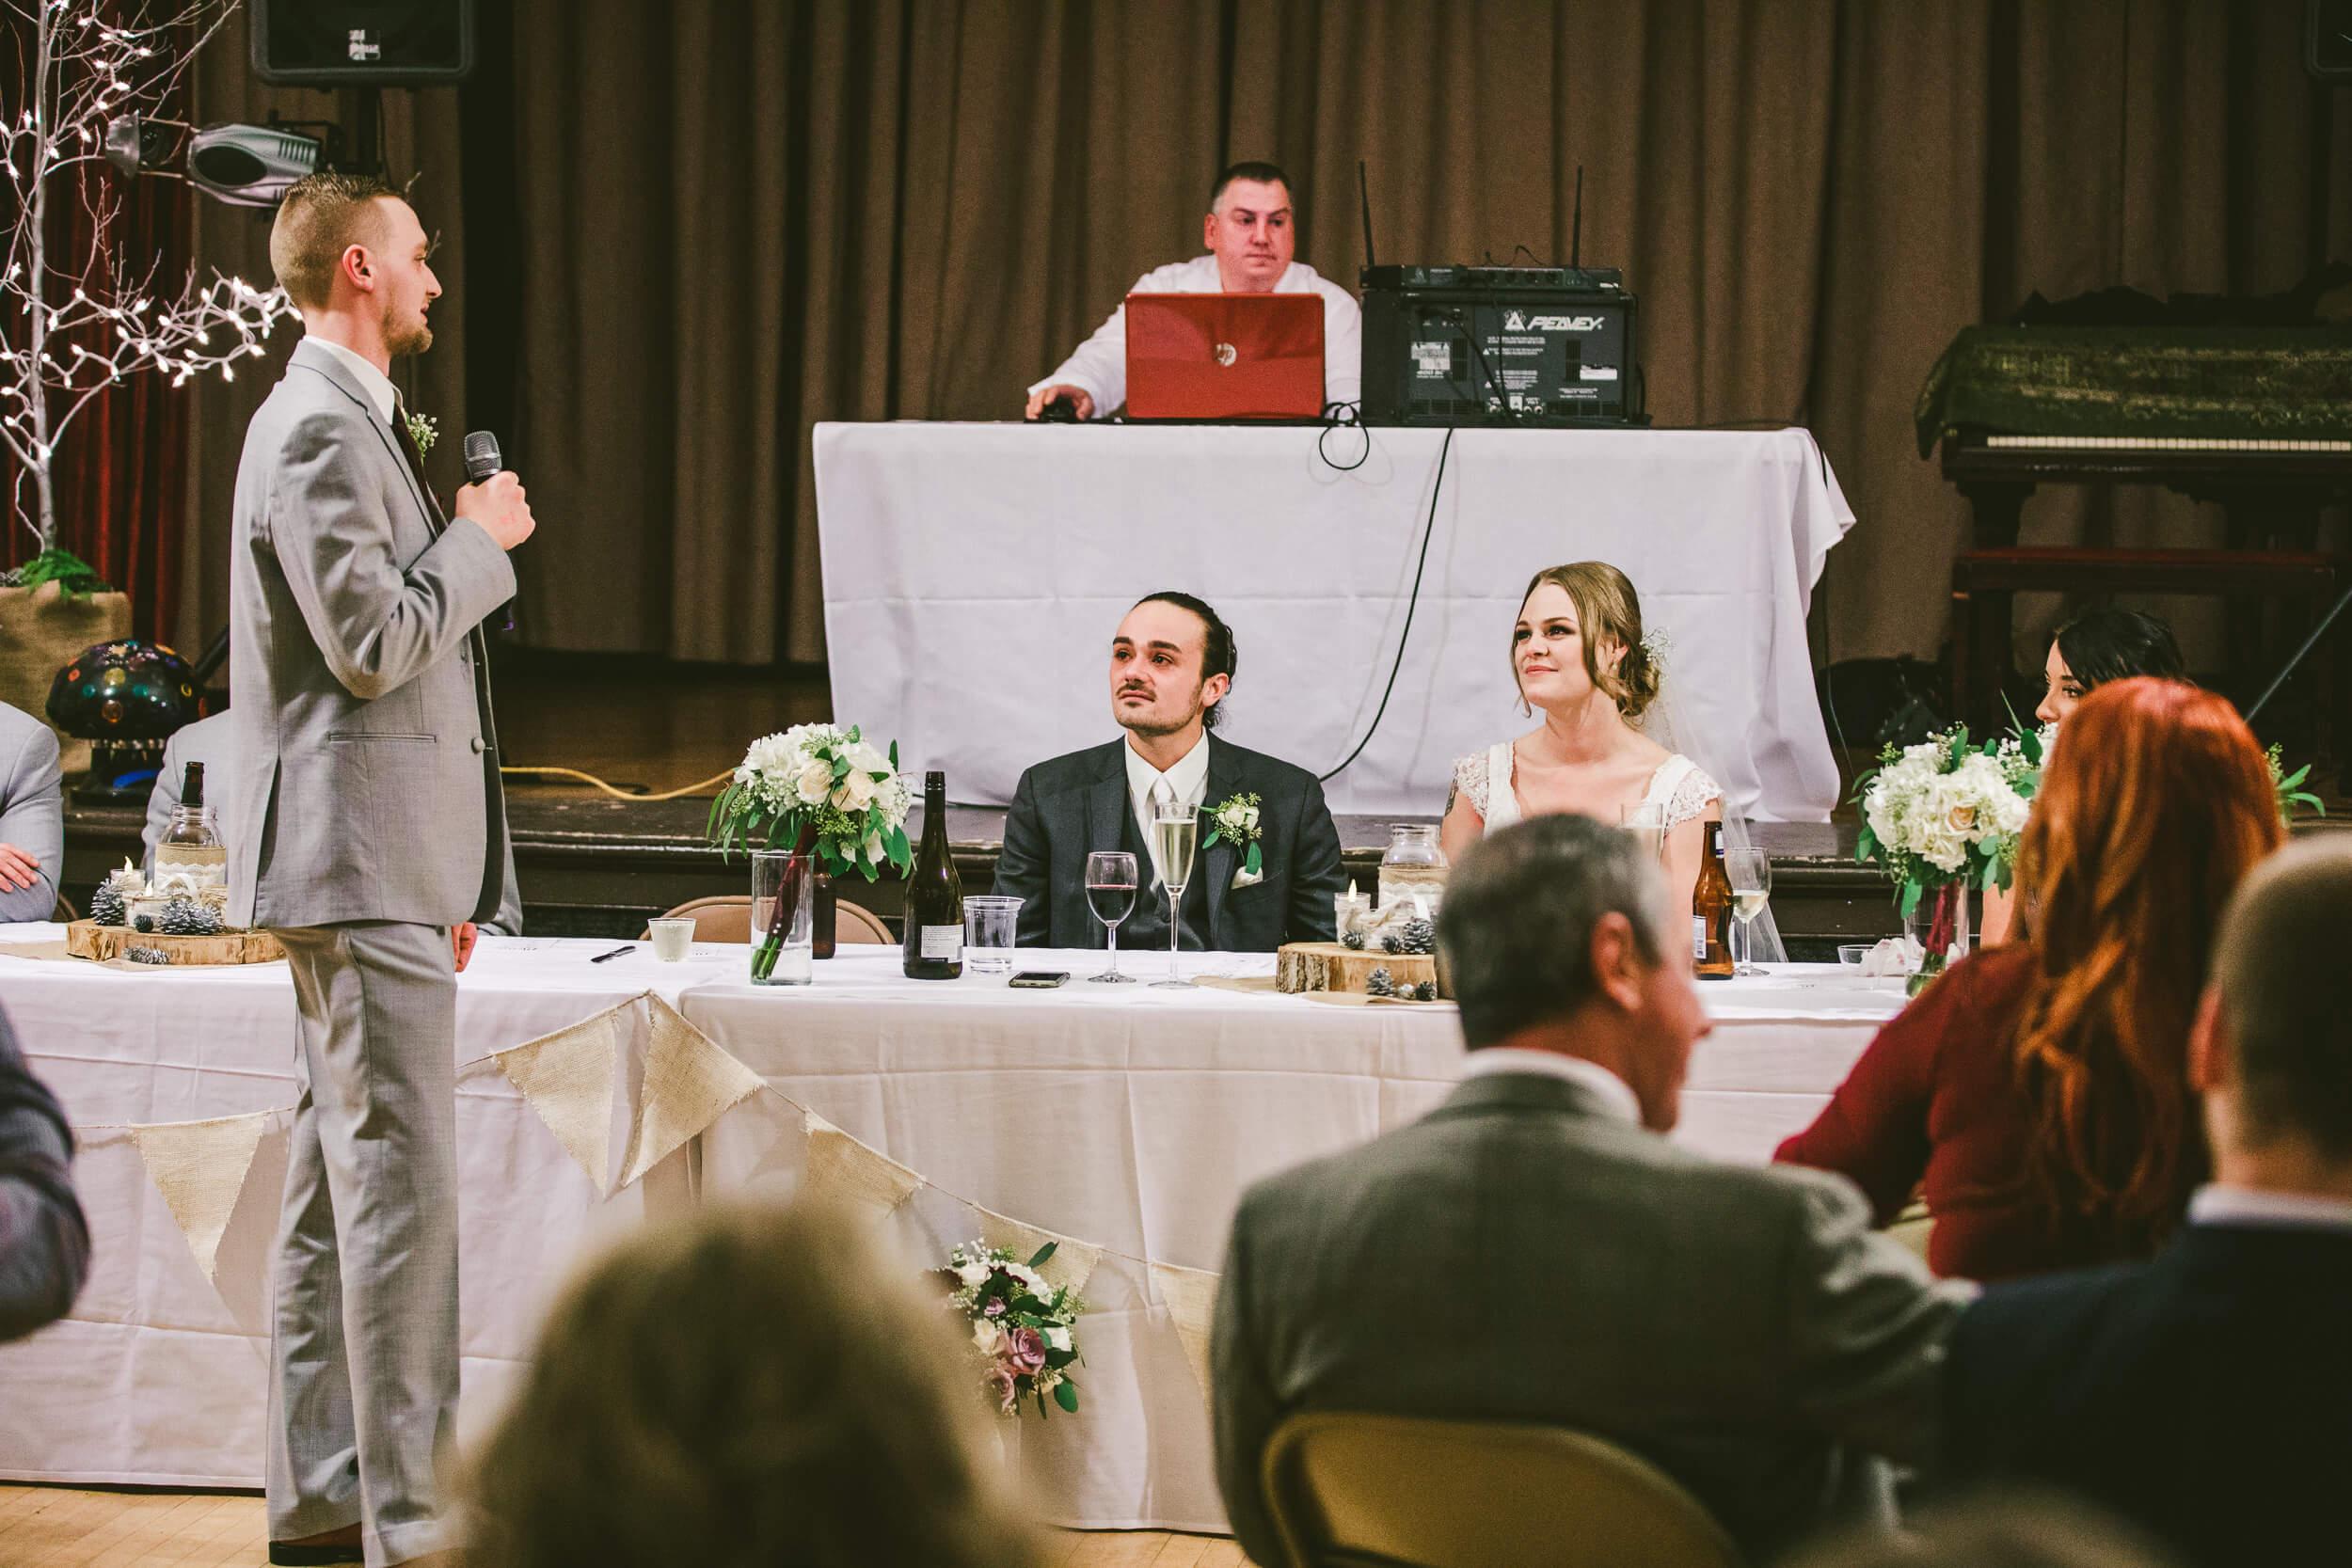 mukogawa winter wedding in spokane (230).jpg